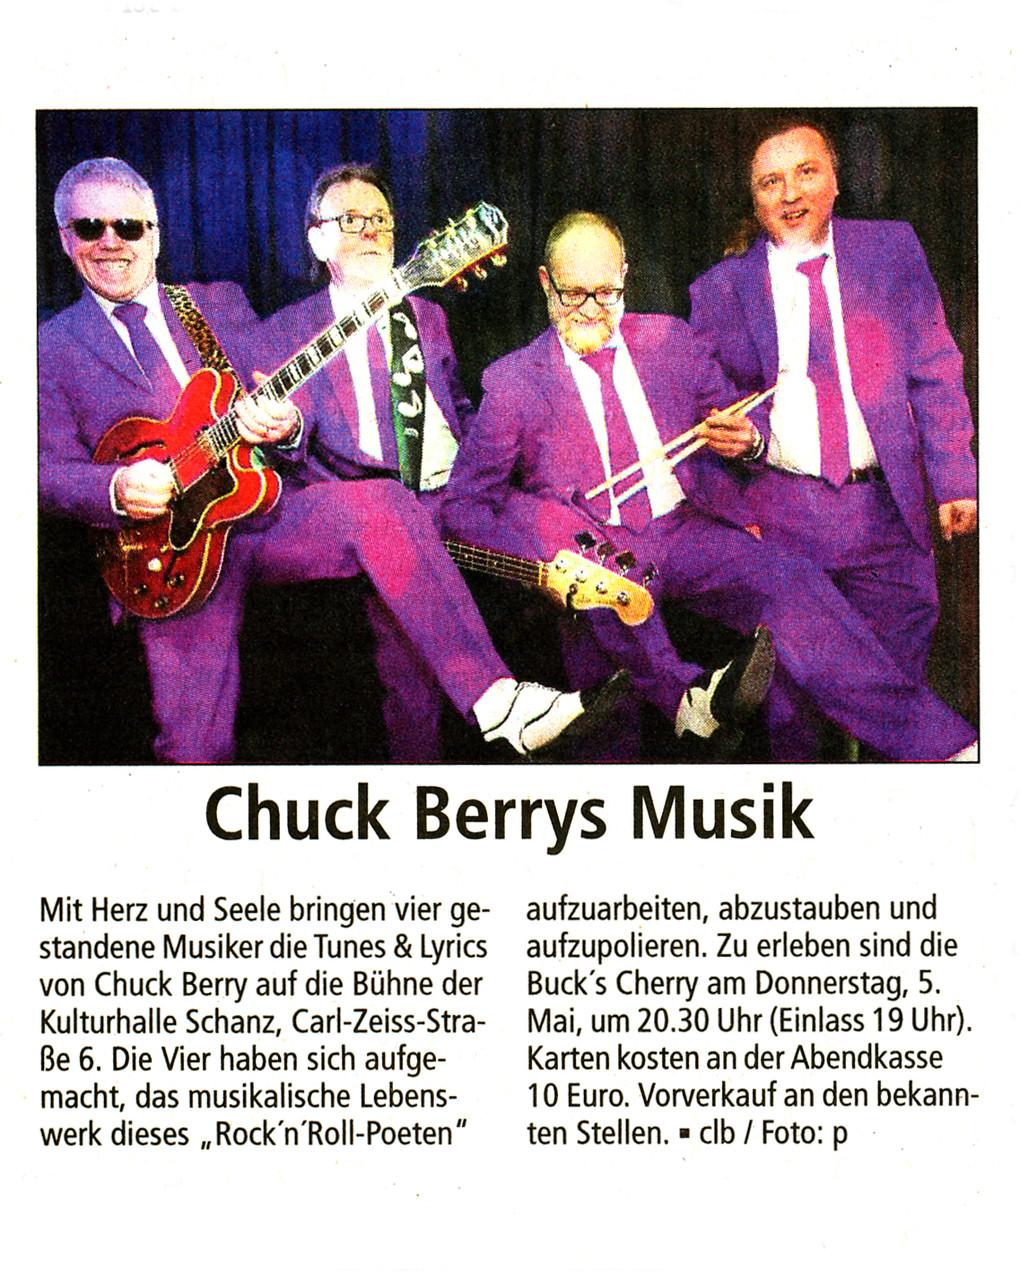 Offenbach Post, 19. April 2016